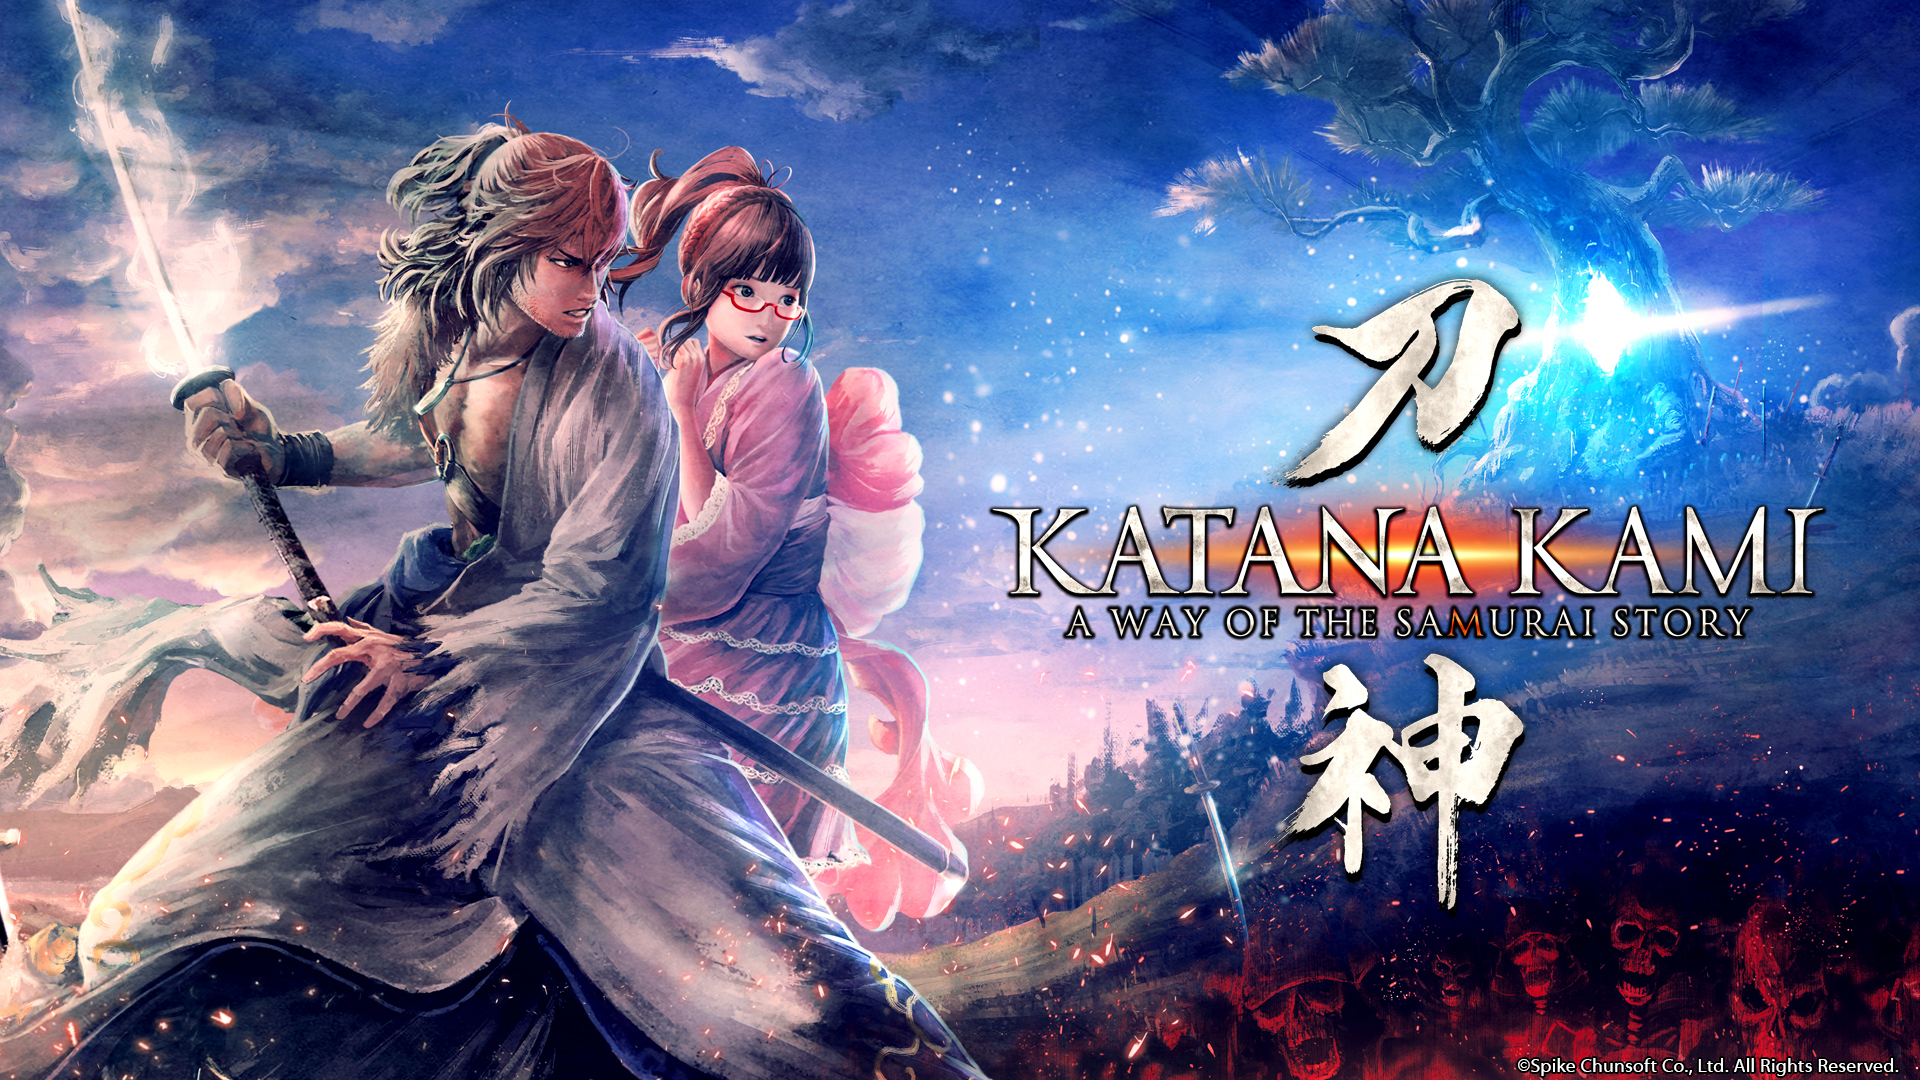 The history of The Way of the Samurai series screenshot